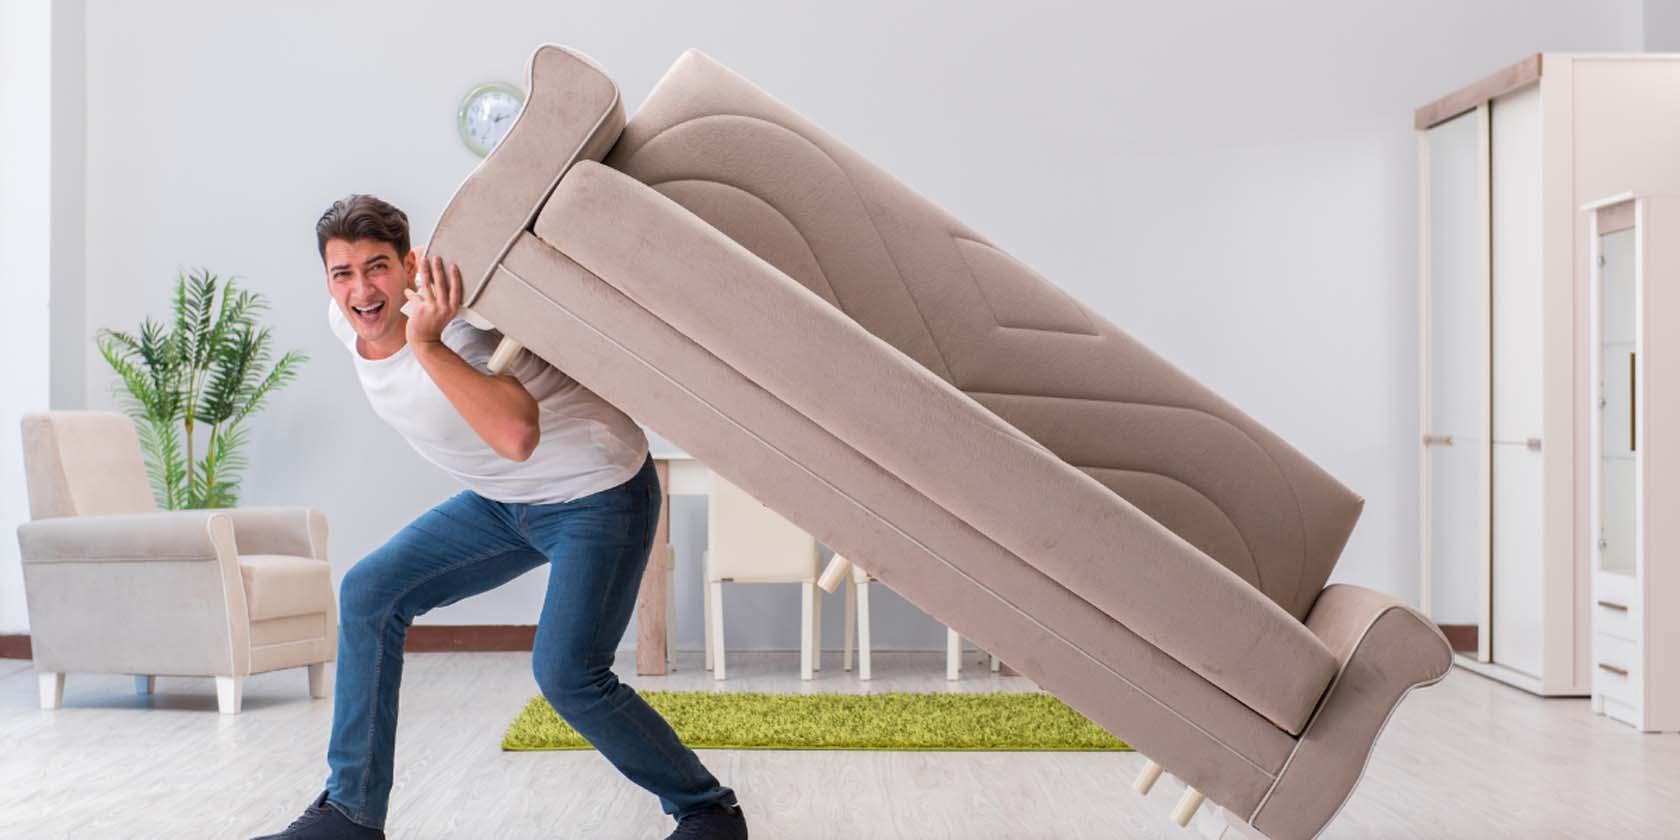 Hassle Free Furniture Move